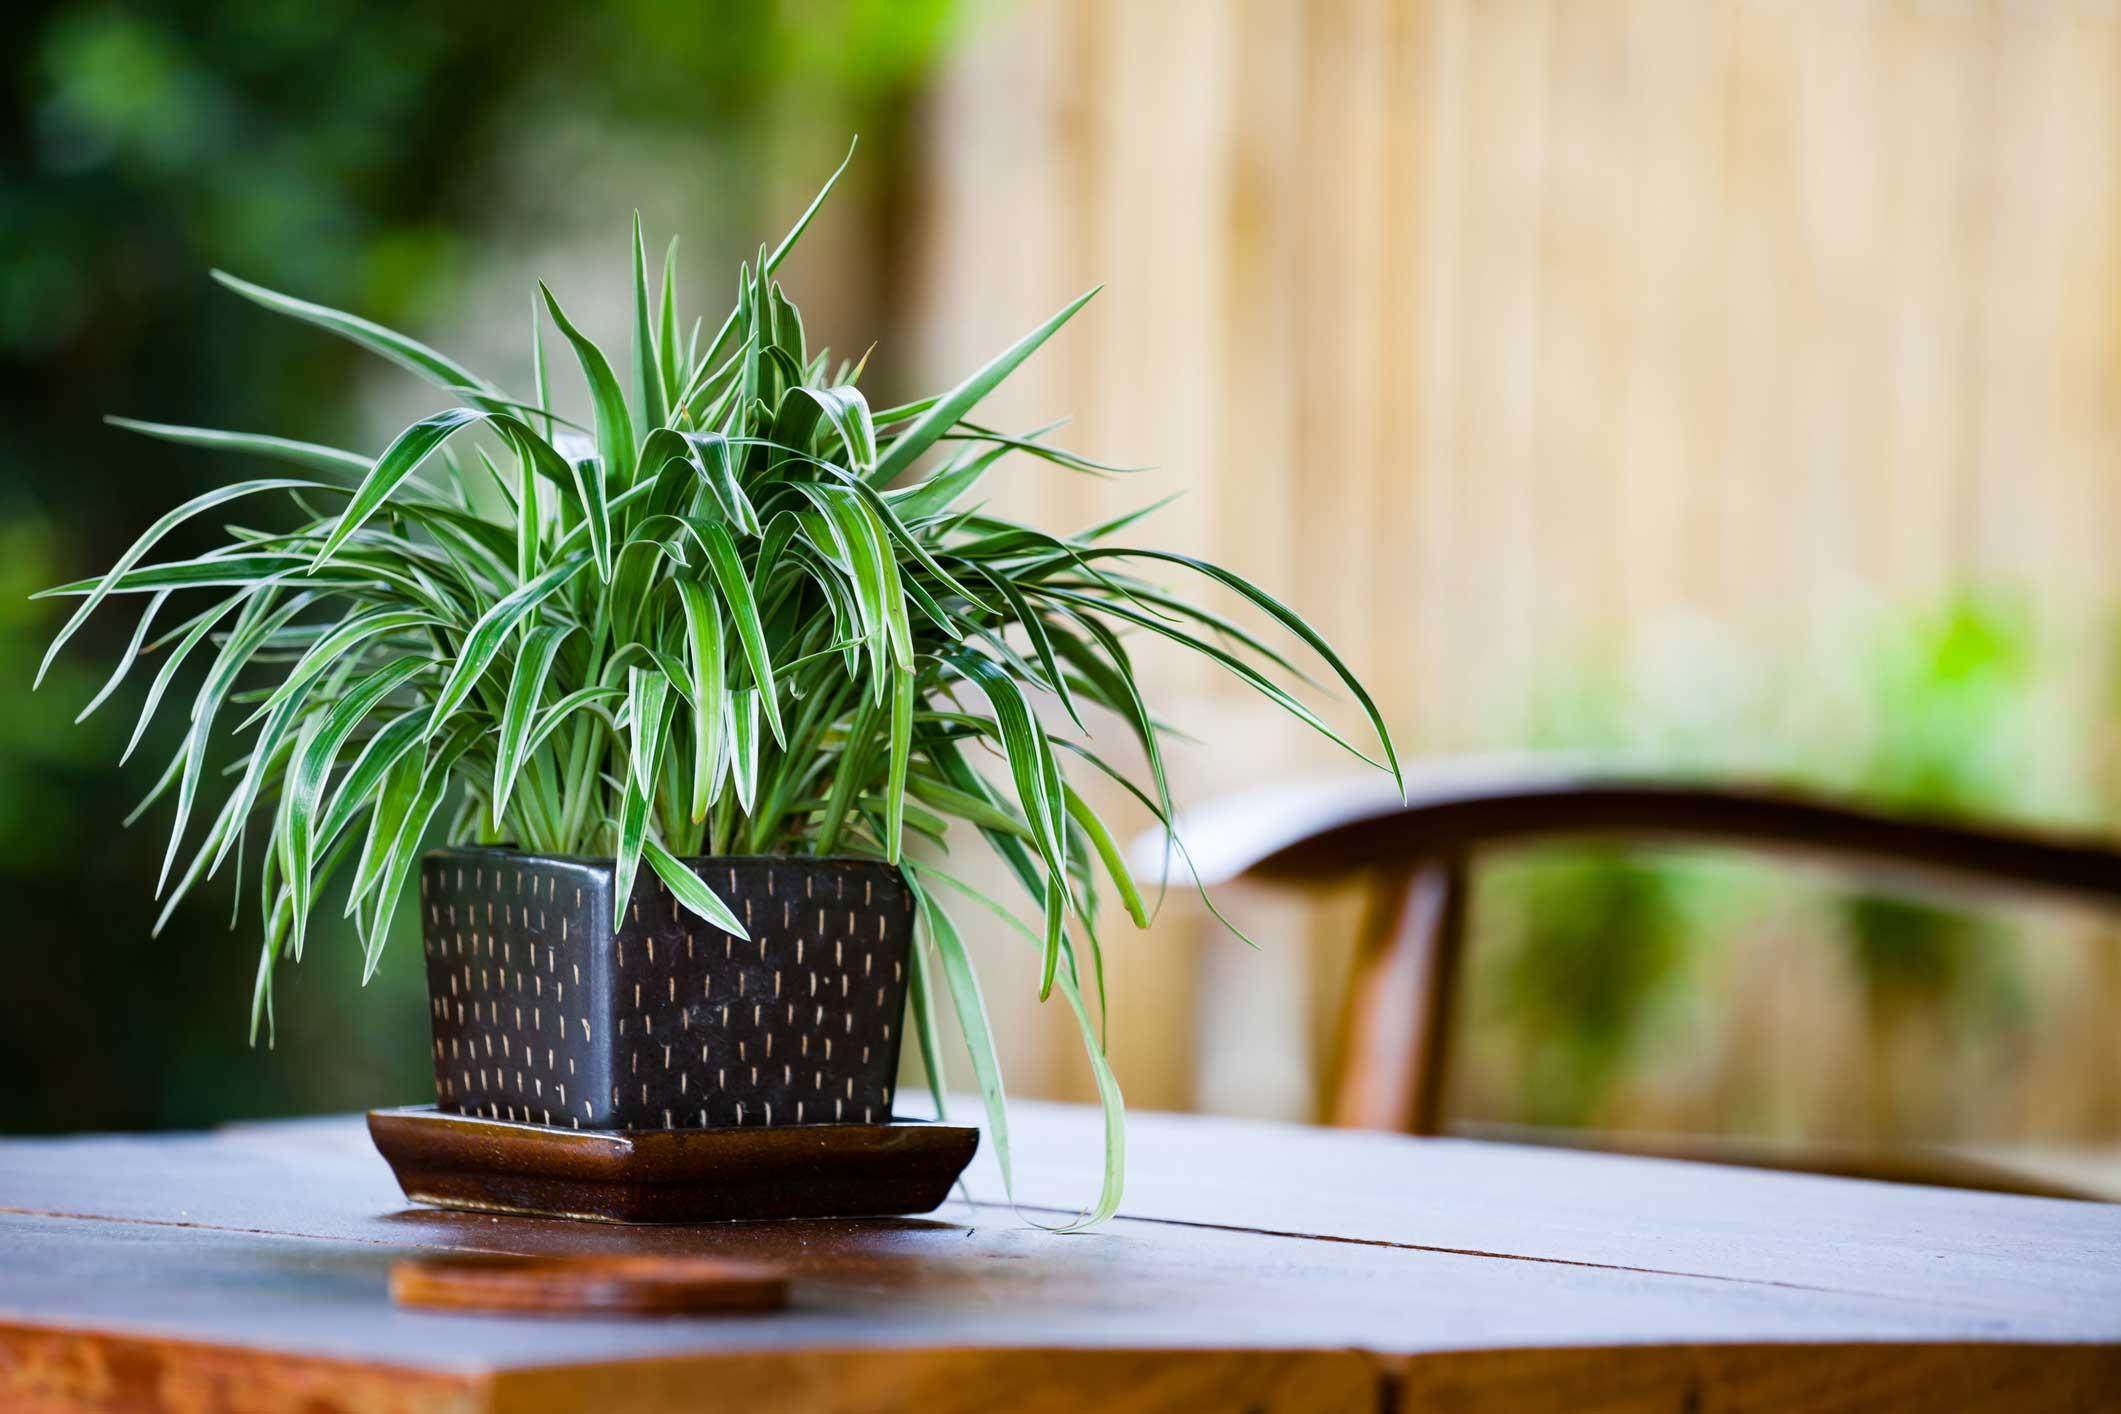 8. Spider Plant